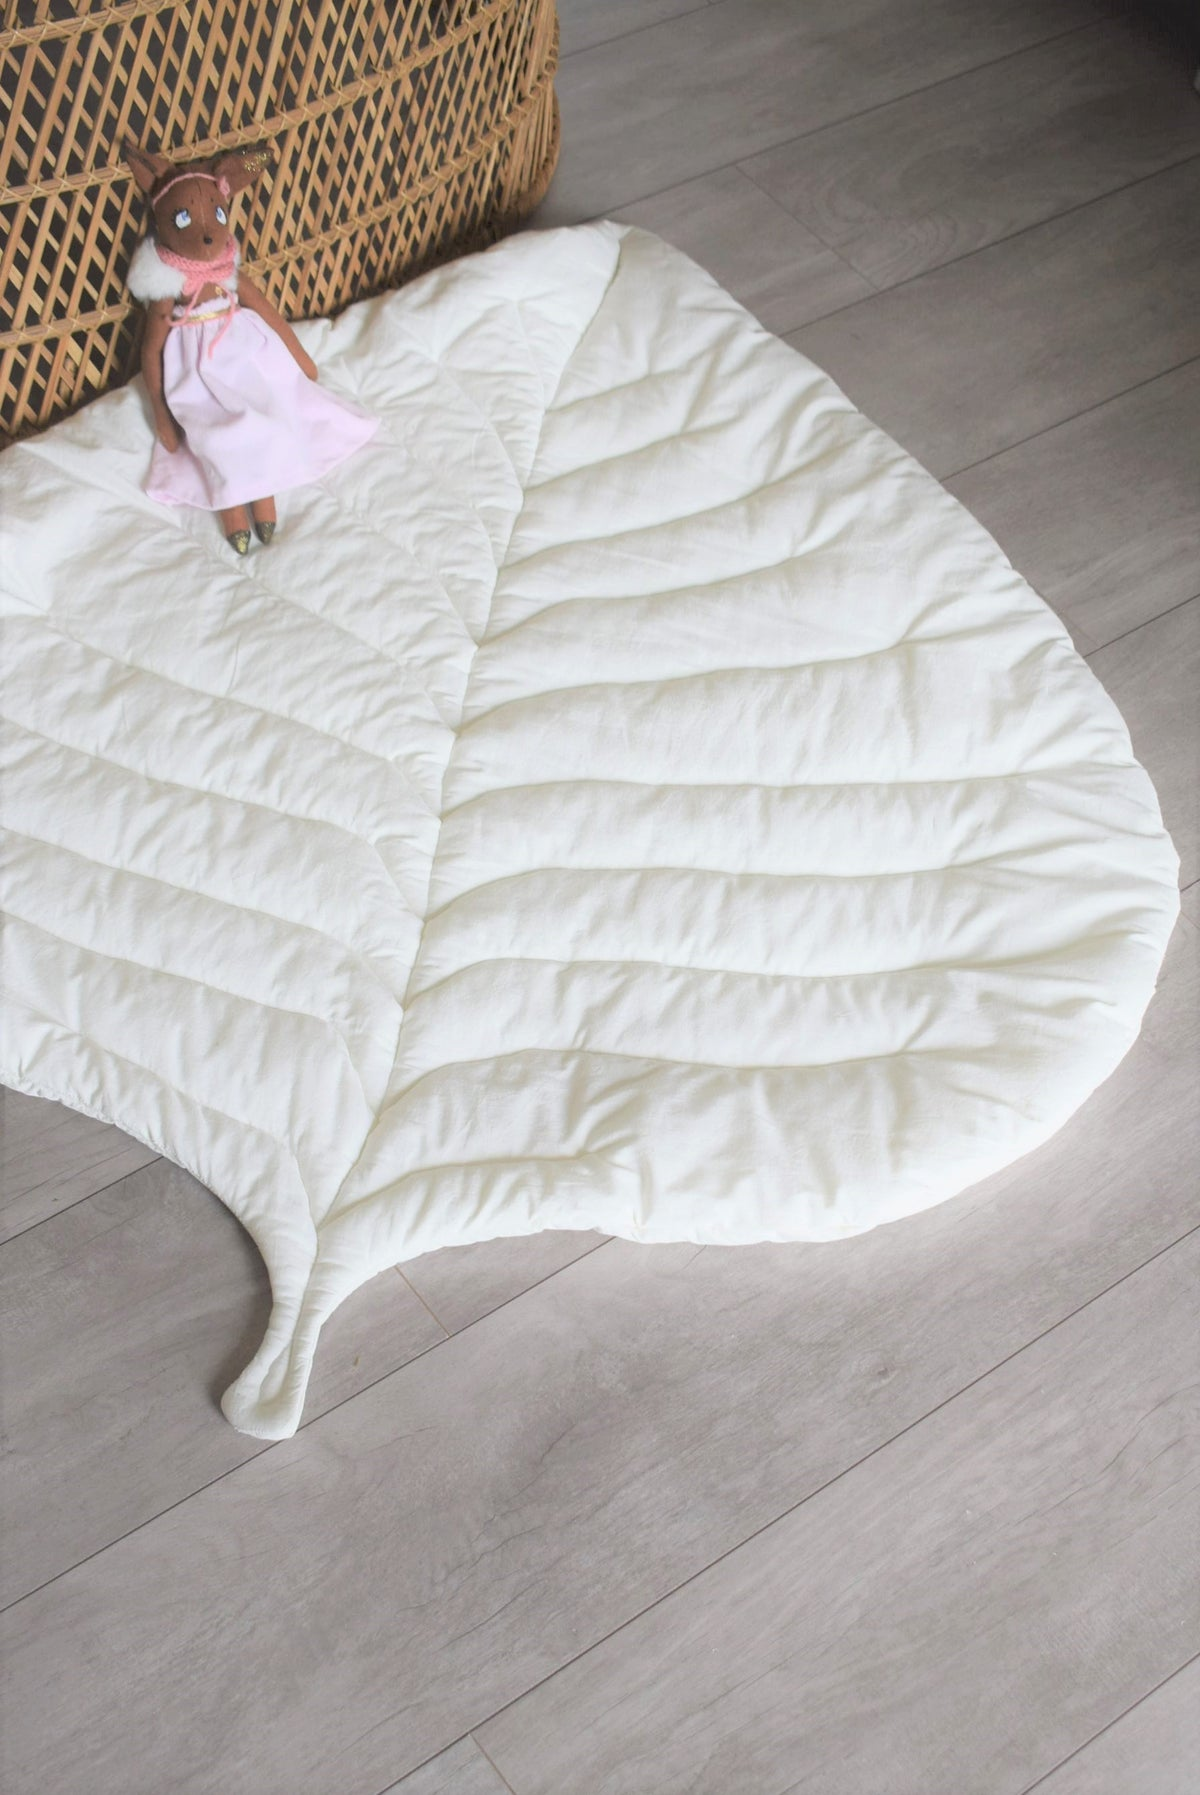 Image of TAPIS FEUILLE GRANDE TAILLE - Modèle unique tissu fleuri